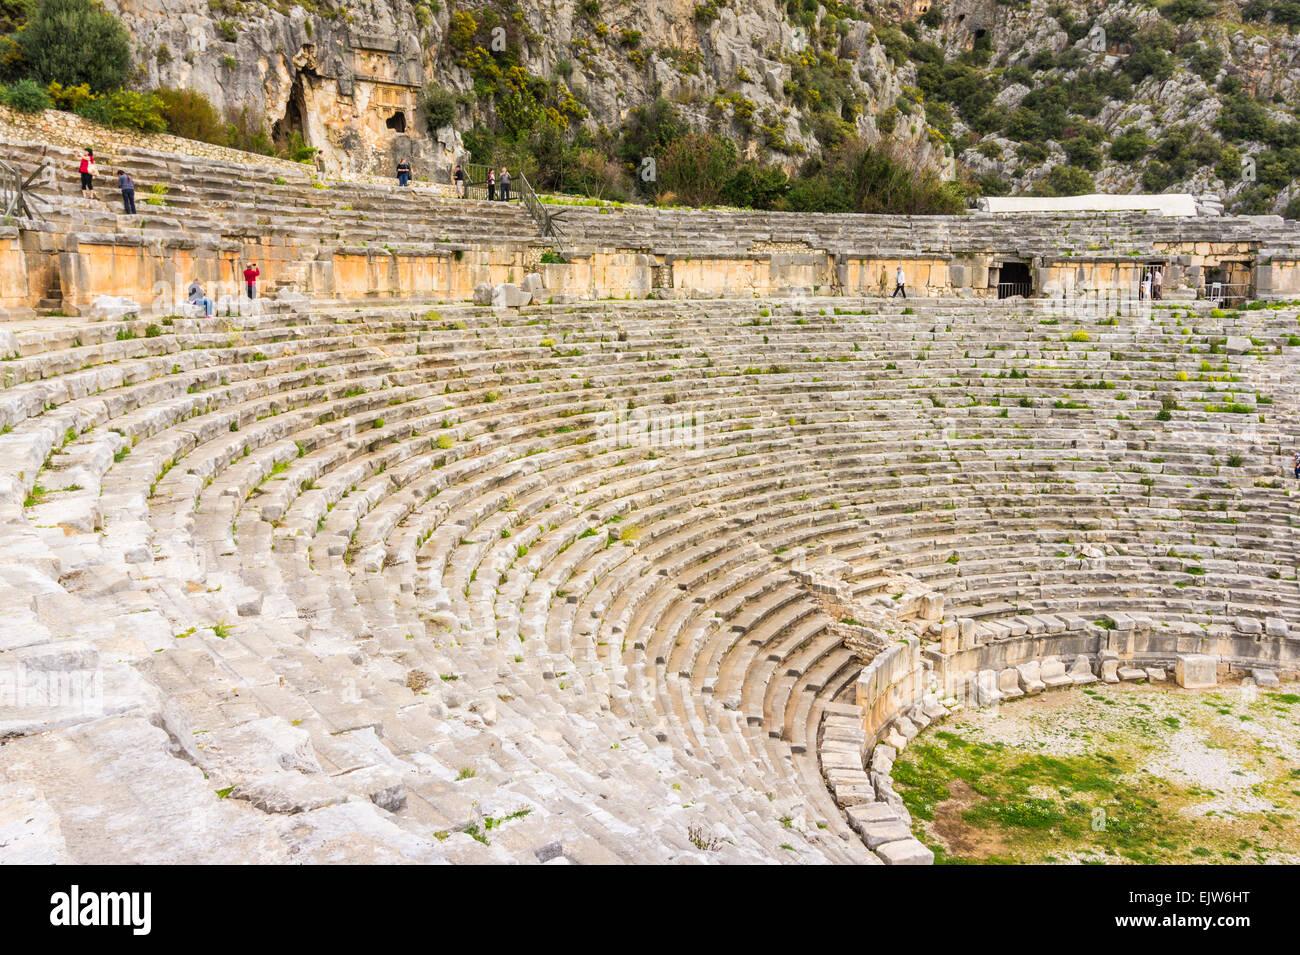 Theatre at Myra, Antalya Province, Aegean Region, Turkey - Stock Image